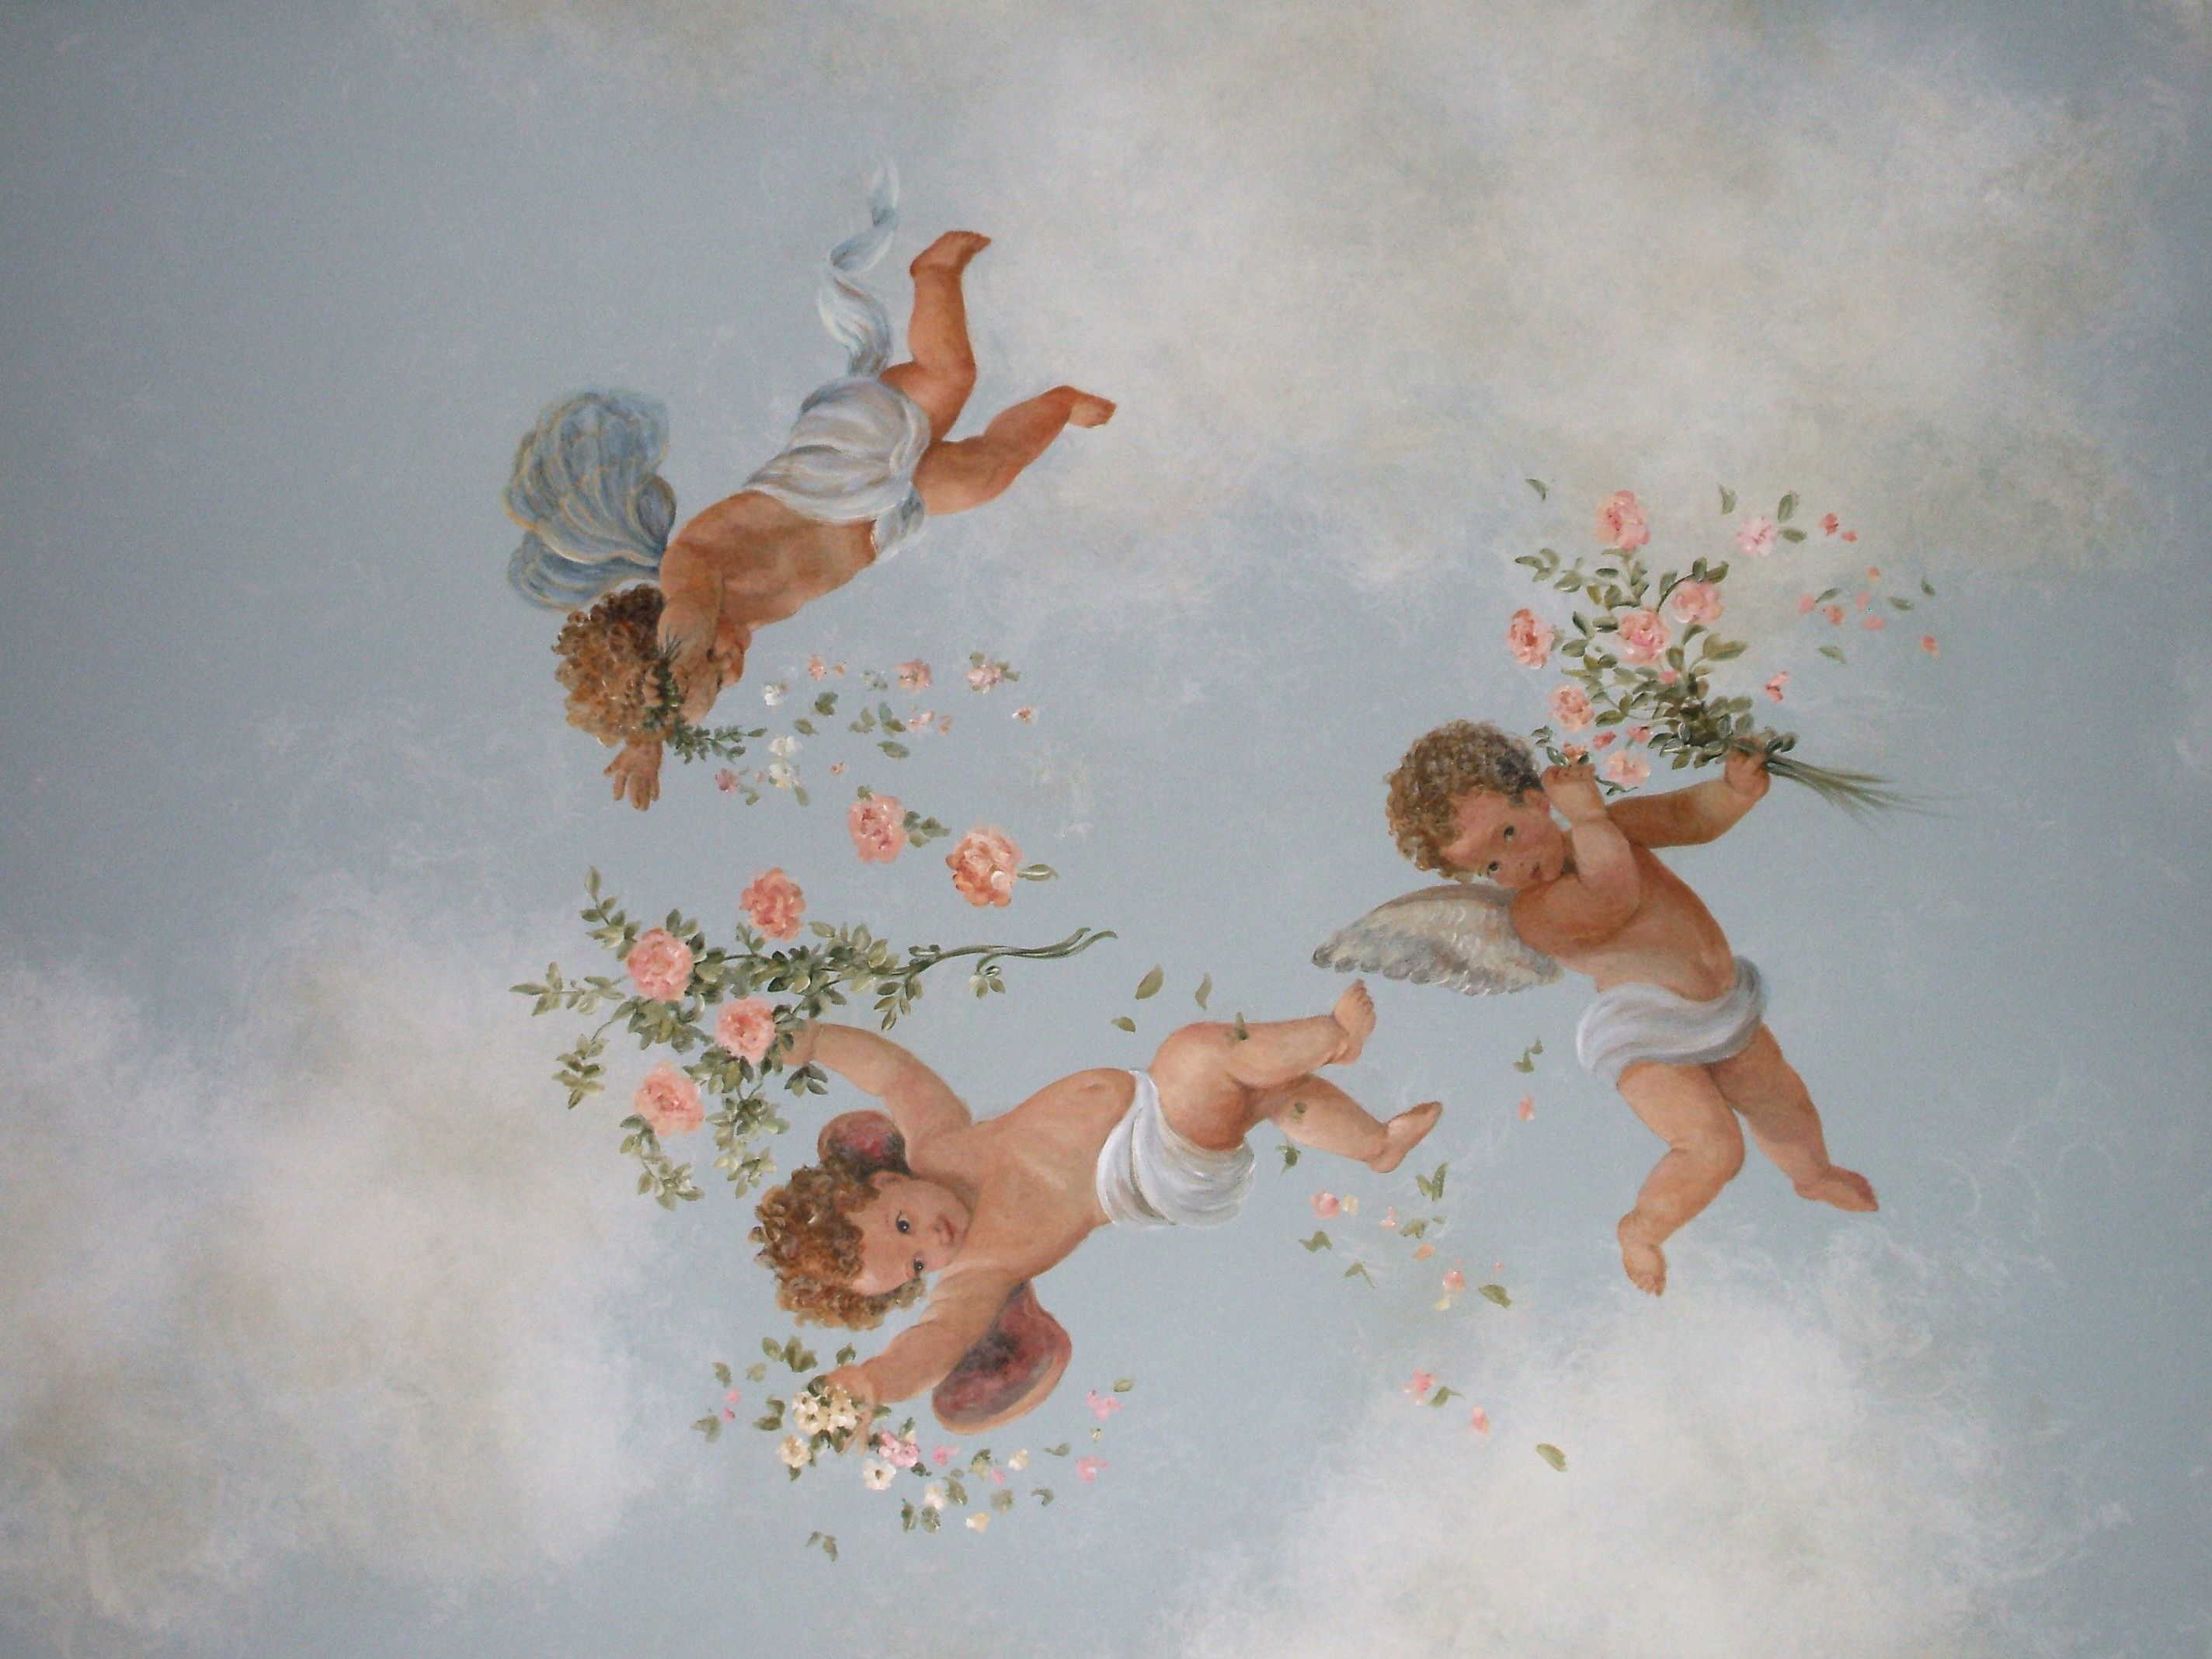 Aesthetic Wallpaper Angel Get Wallpaper Hd In 2020 Angel Wallpaper Angel Painting Angel Aesthetic